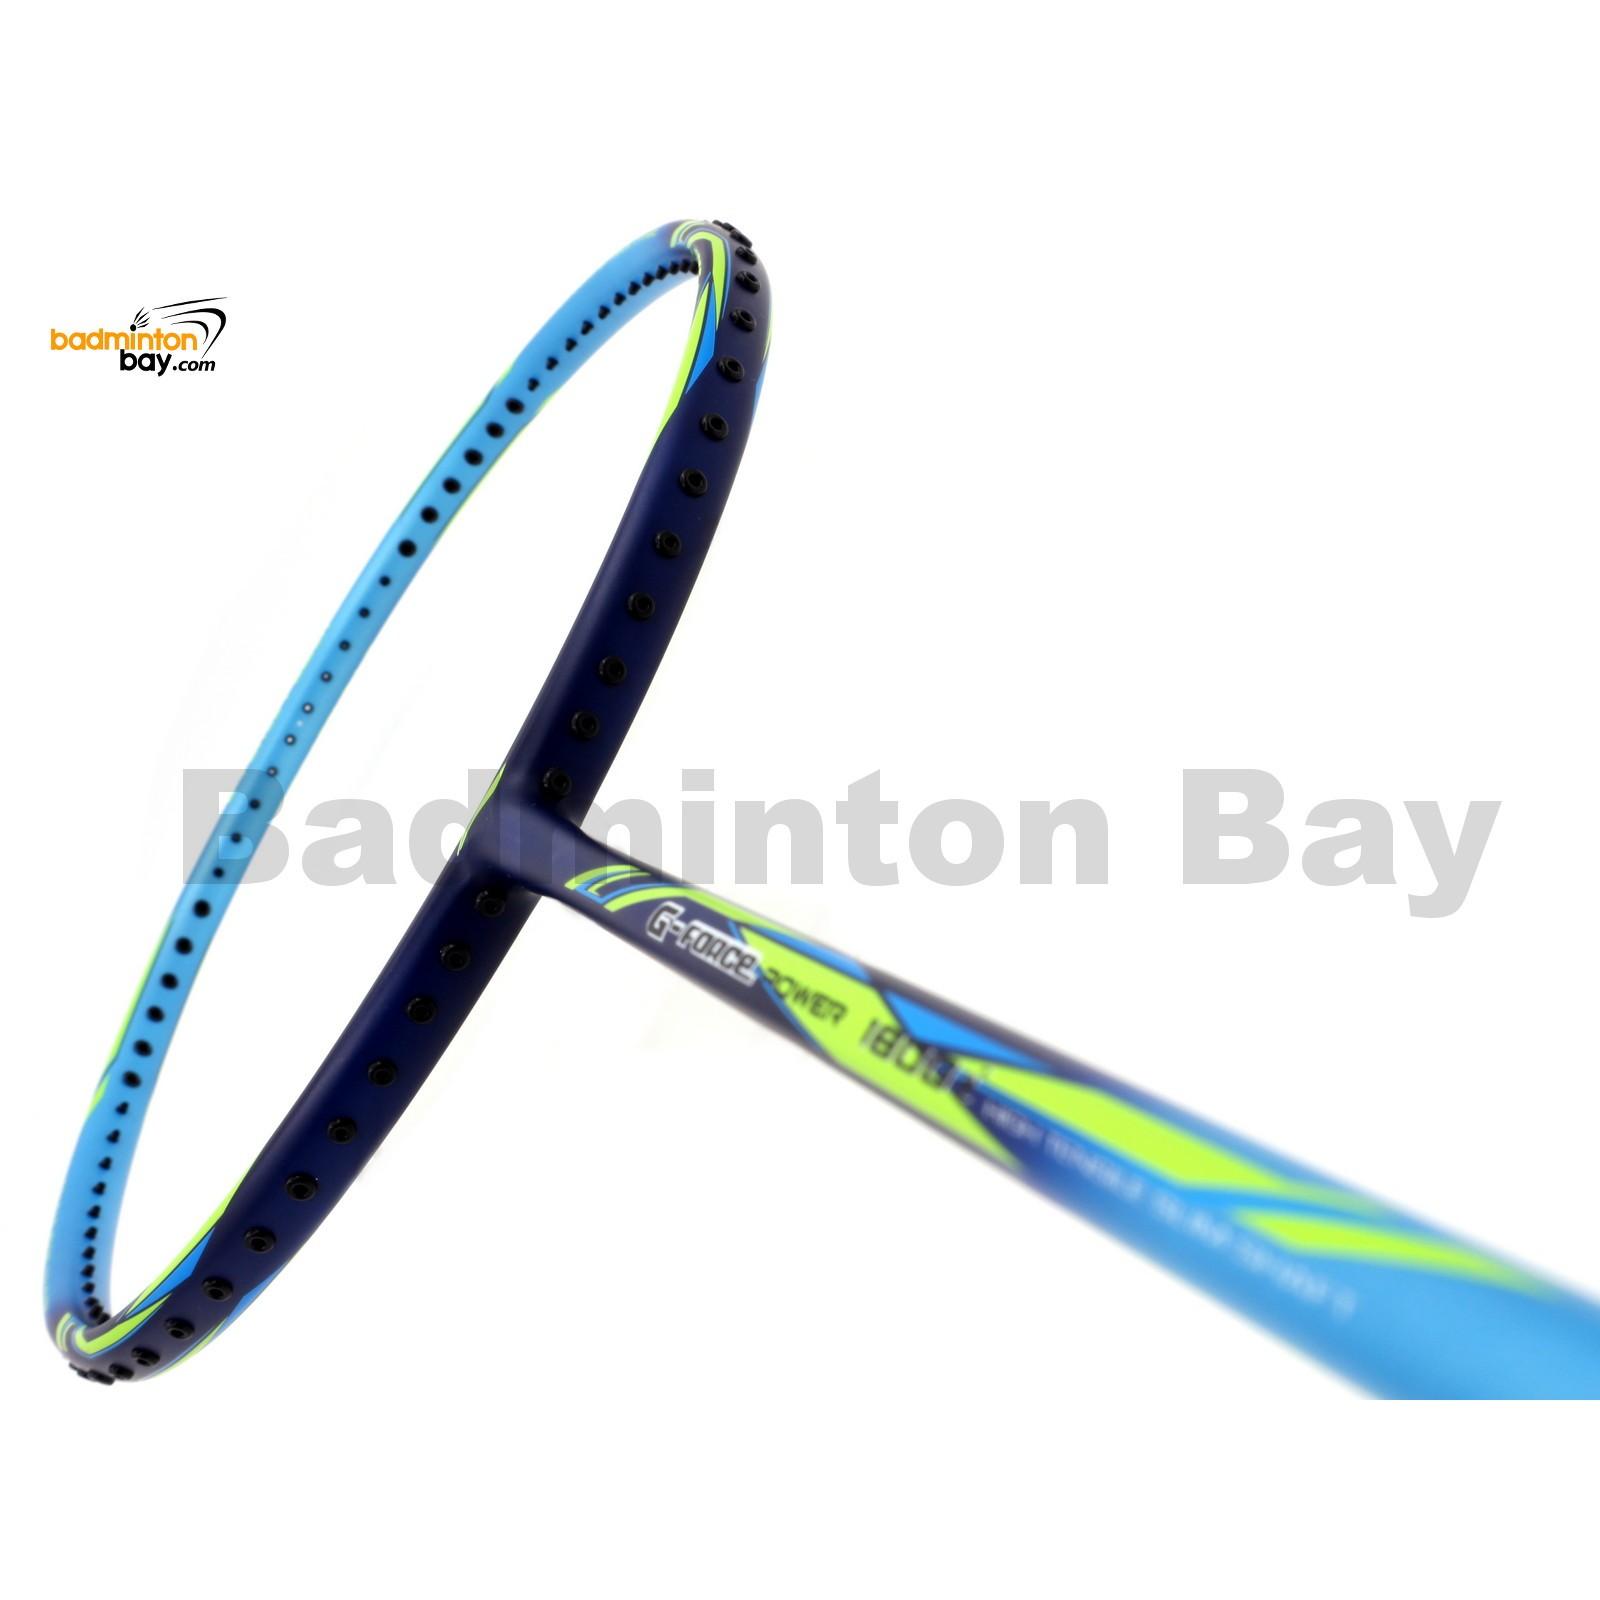 li ning g force power 1800i blue green badminton racket 3u w3 s2